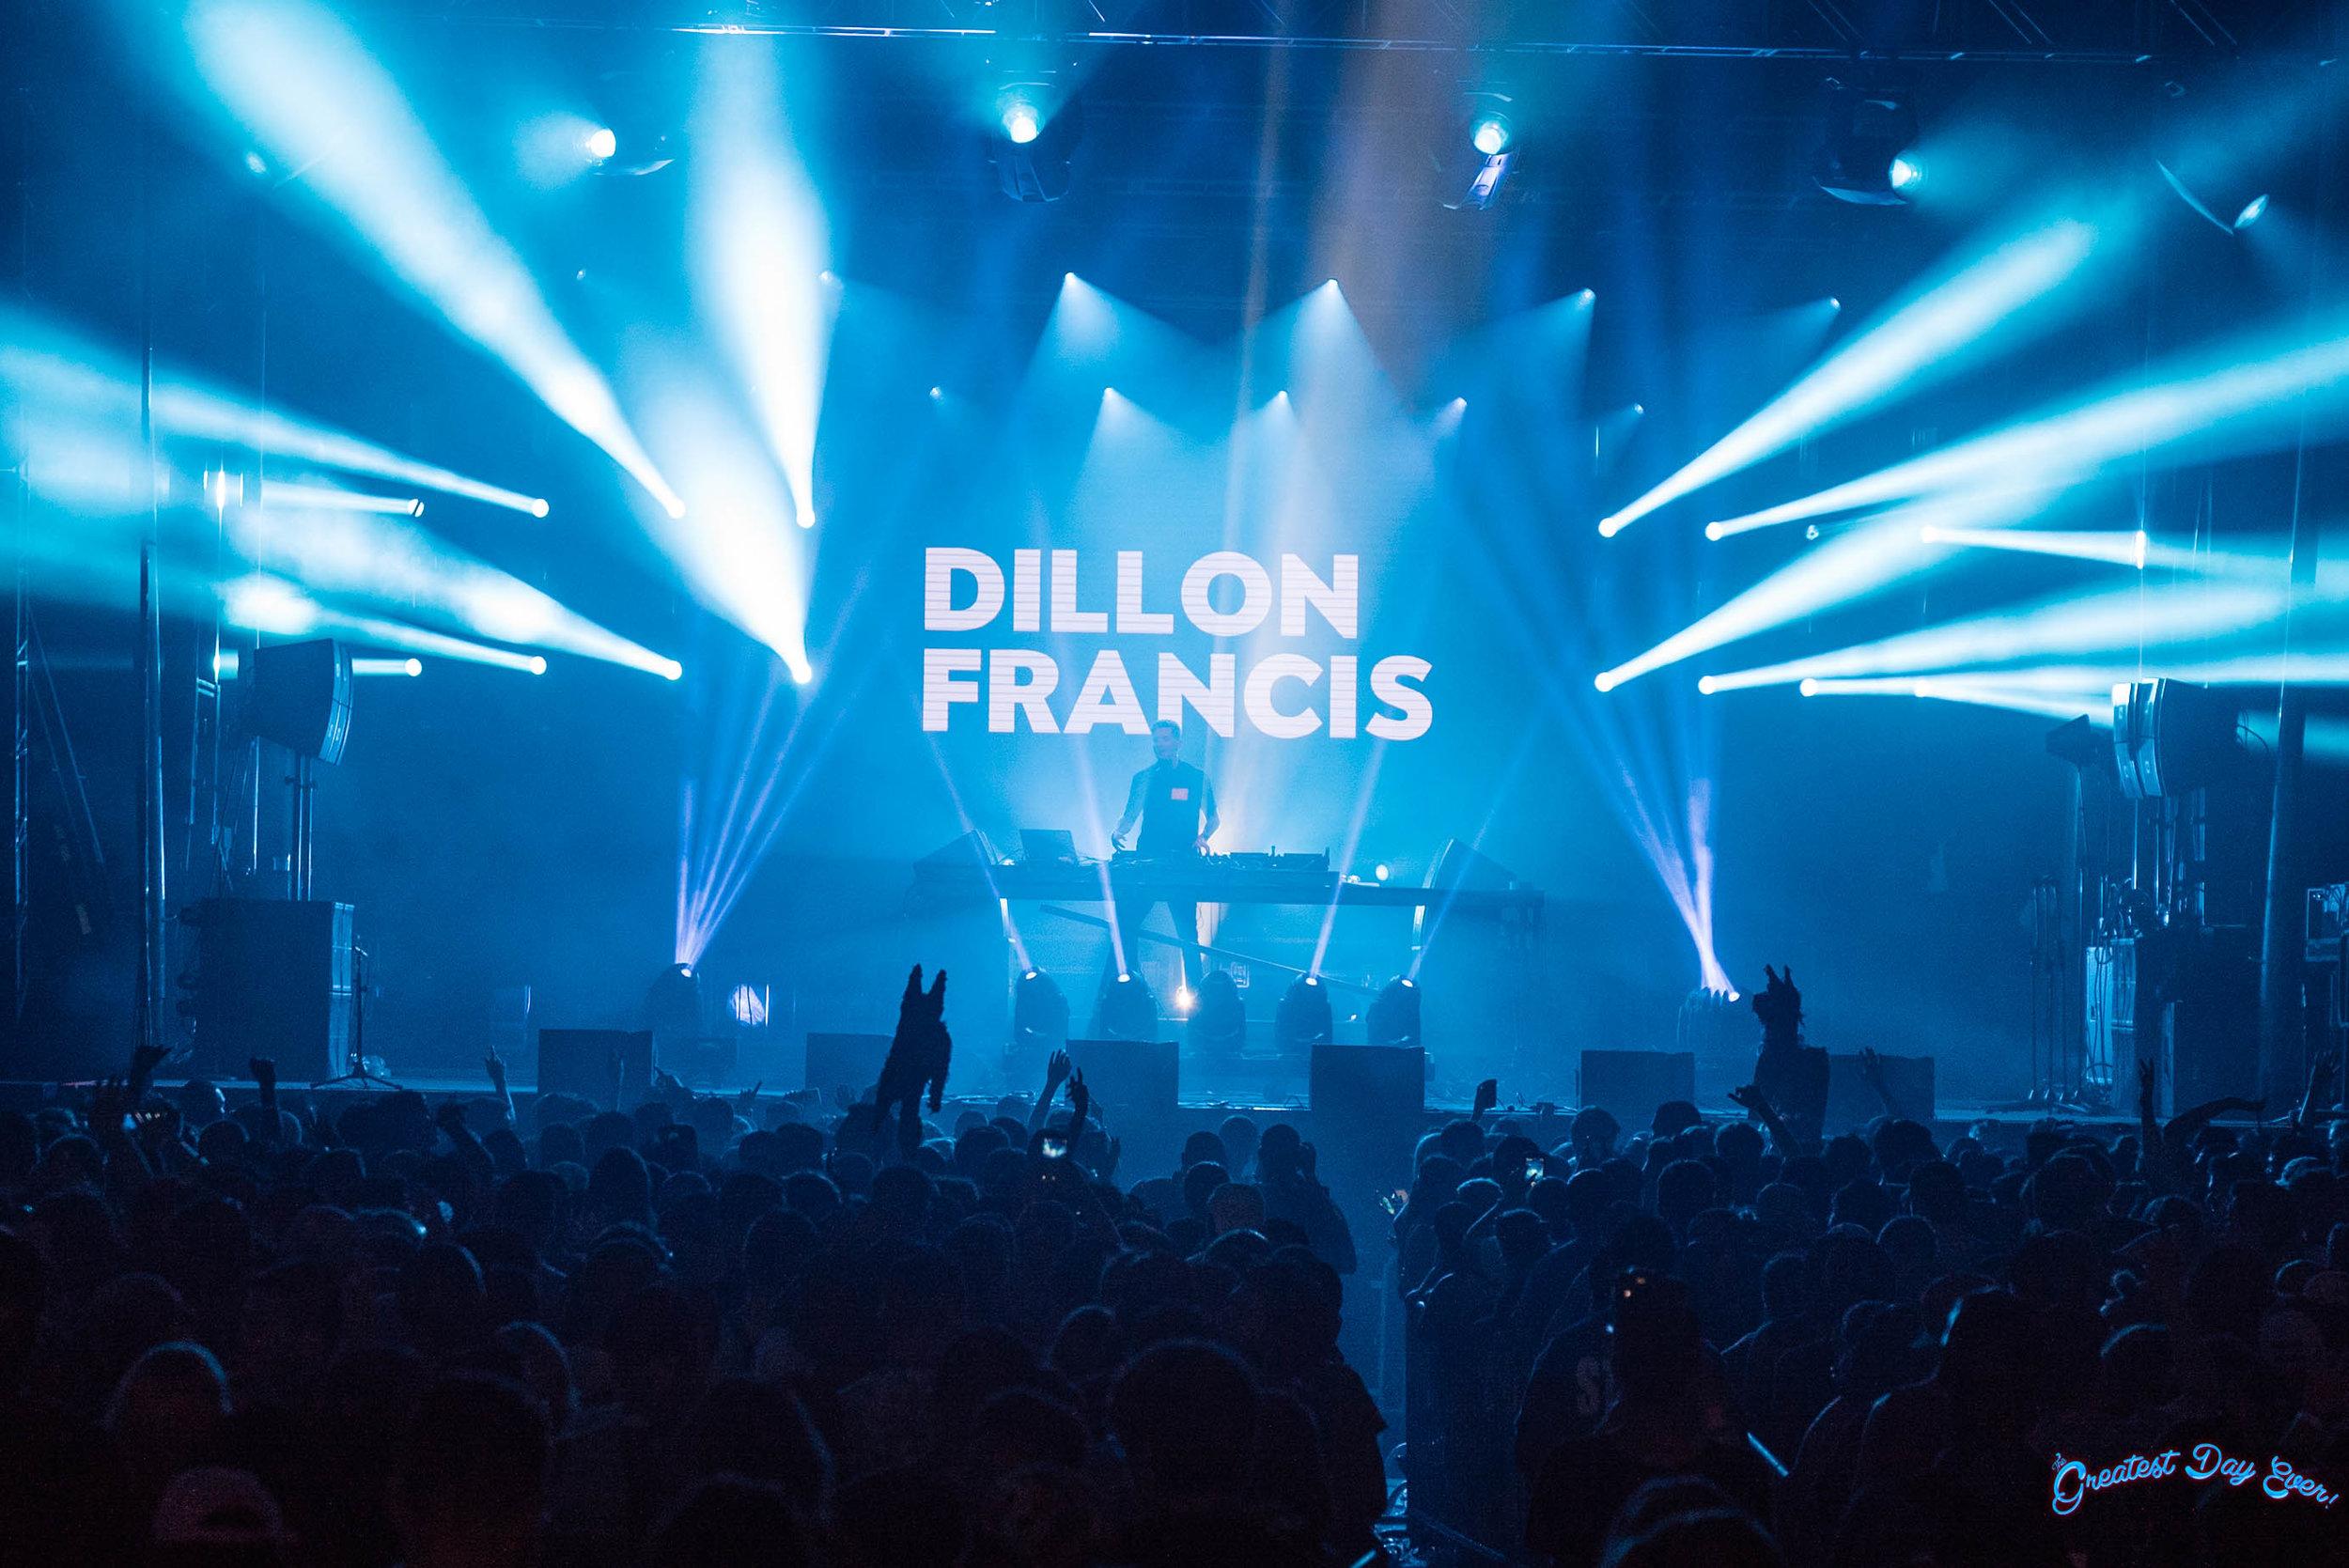 170716_DillonFrancis15.jpg